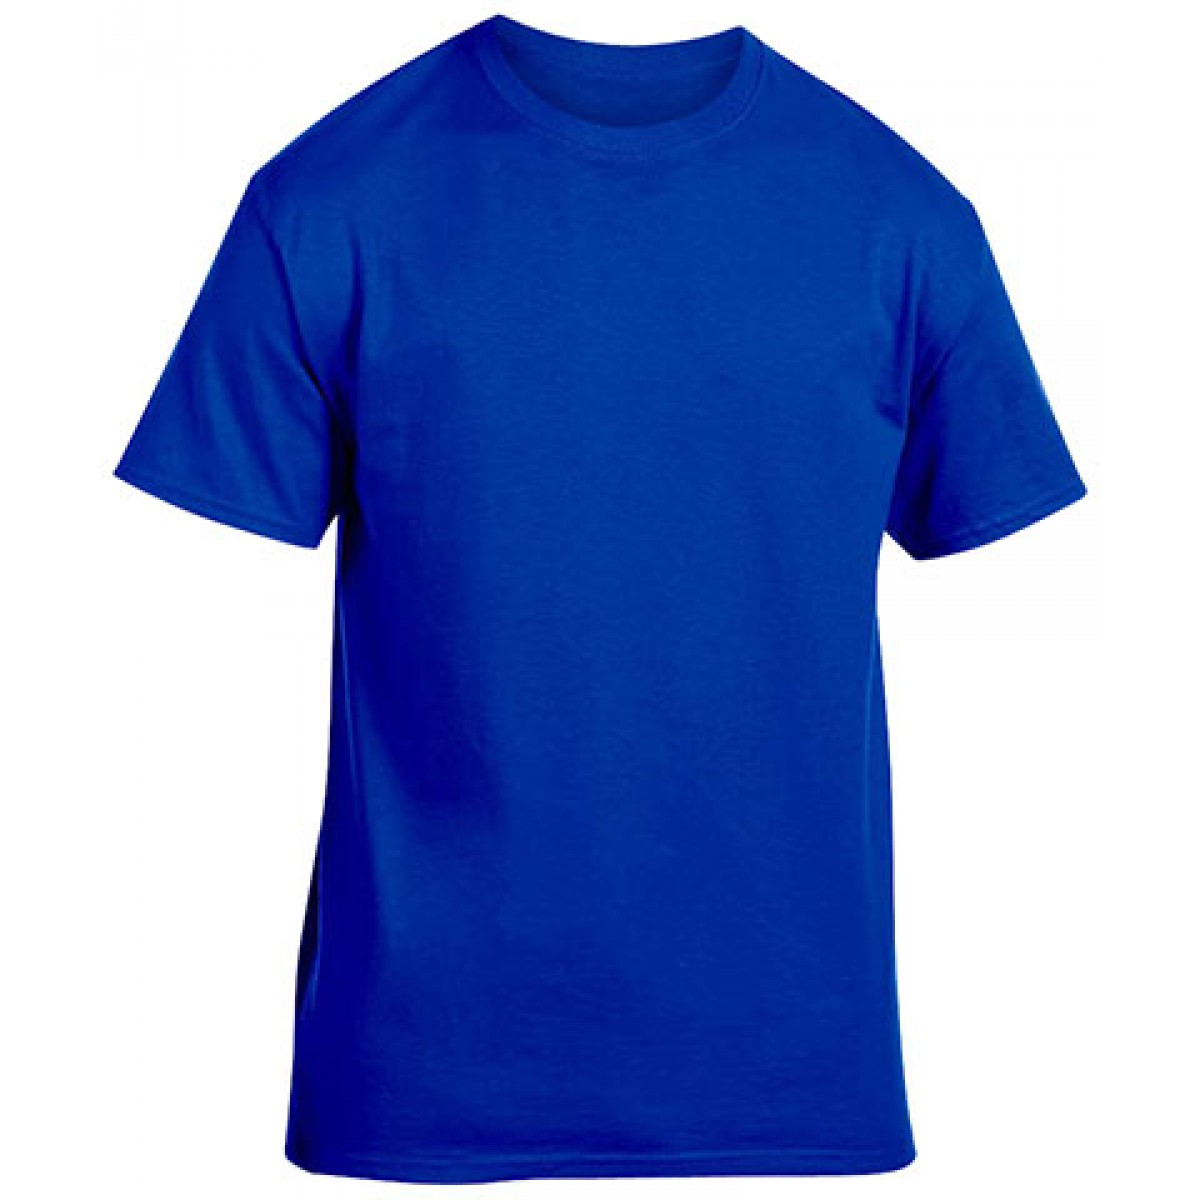 Heavy Cotton Activewear T-Shirt-Navy-S